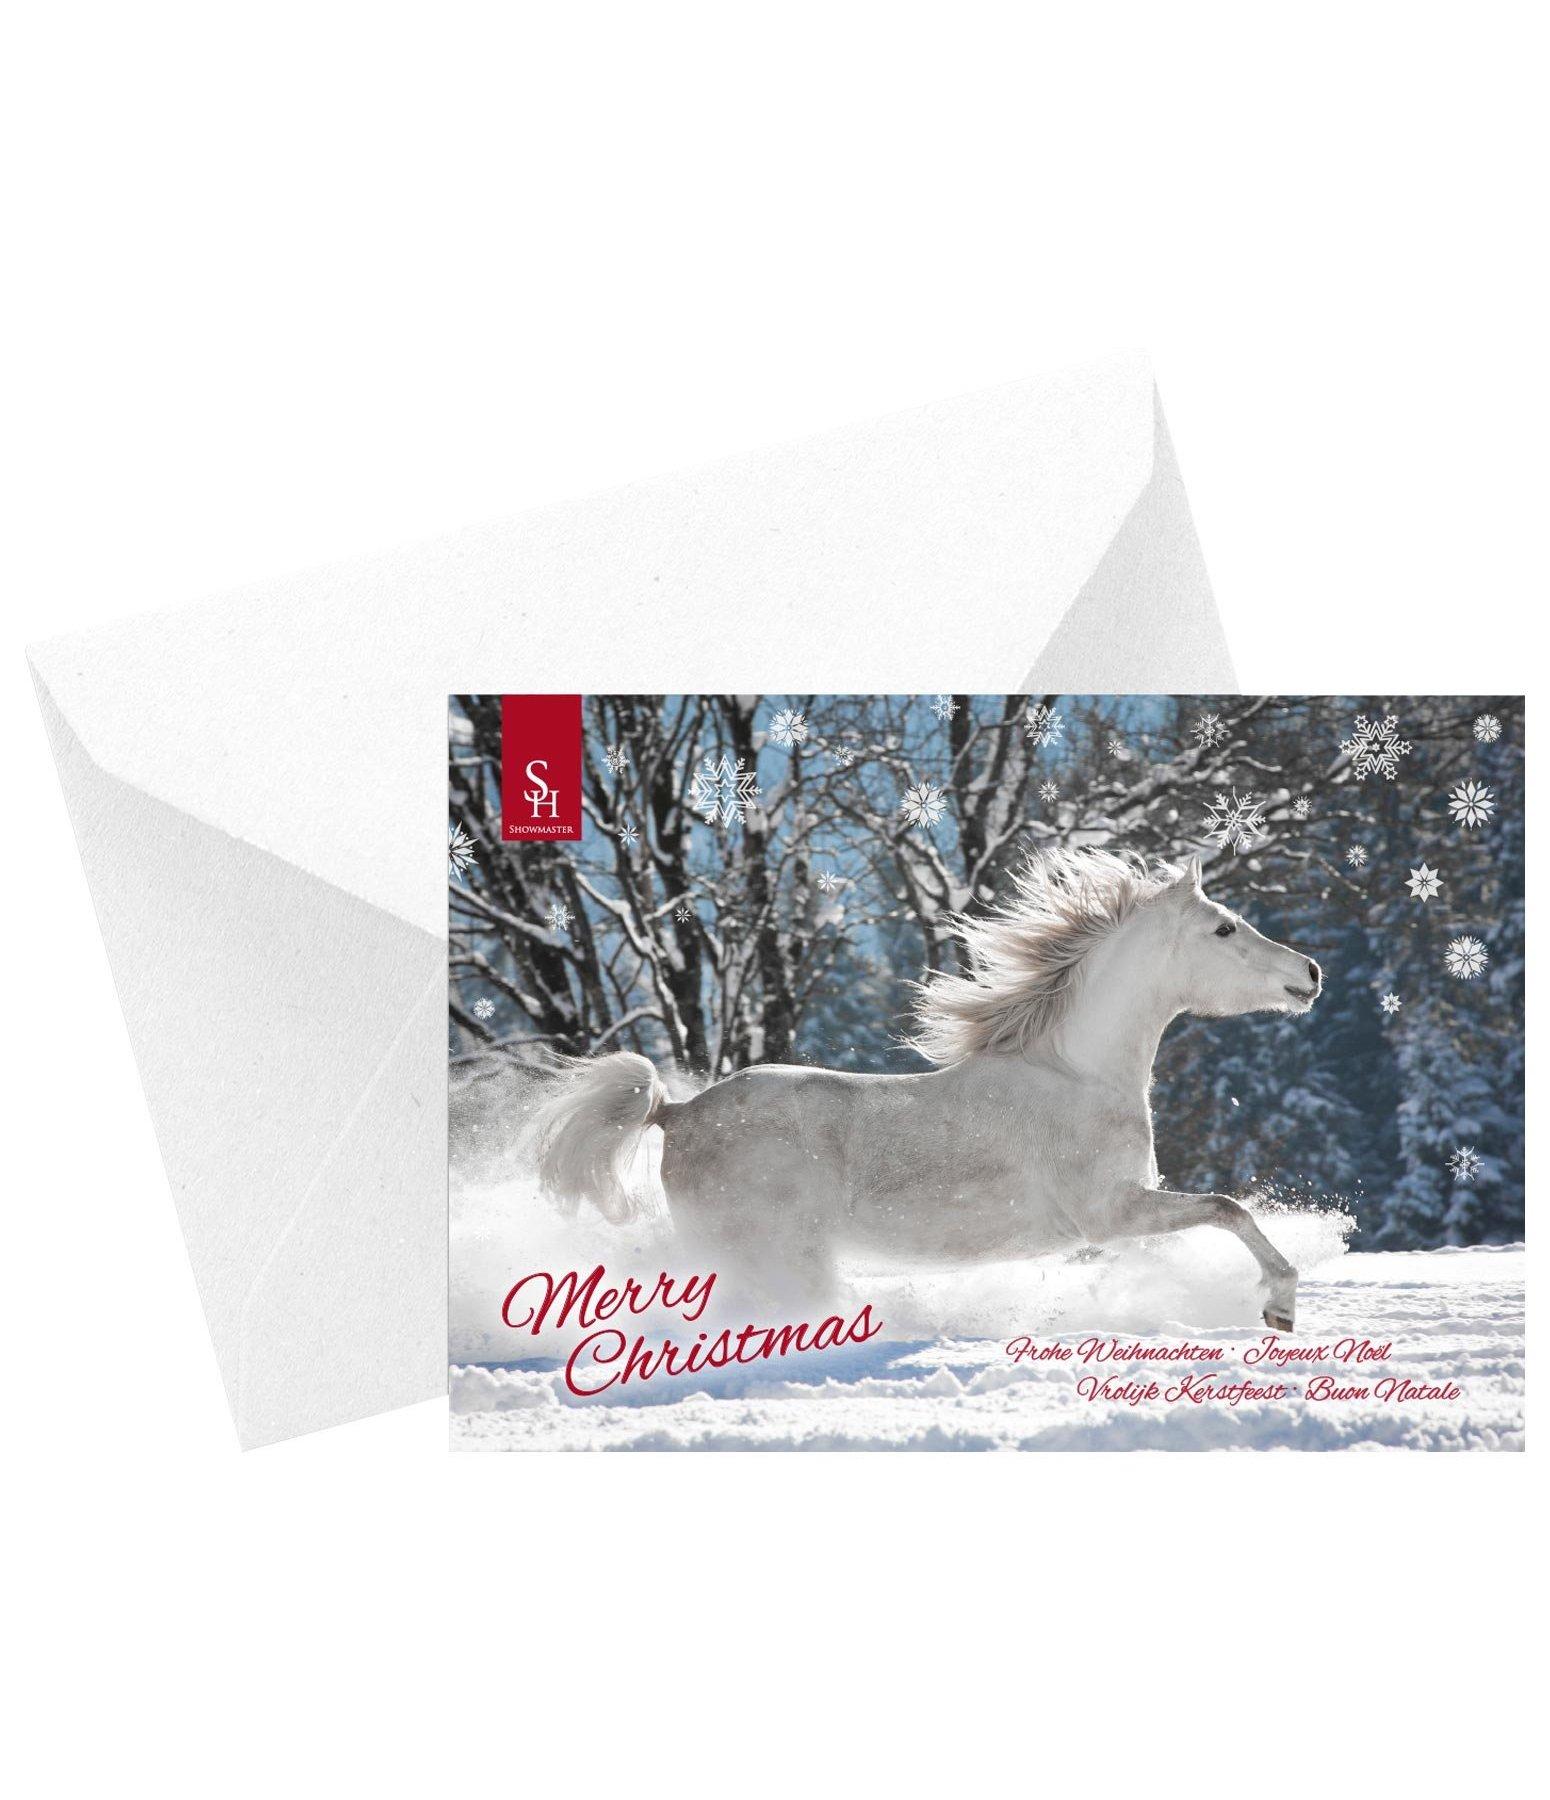 Grußkarte Merry Christmas - Geschenkartikel - Krämer Pferdesport ...